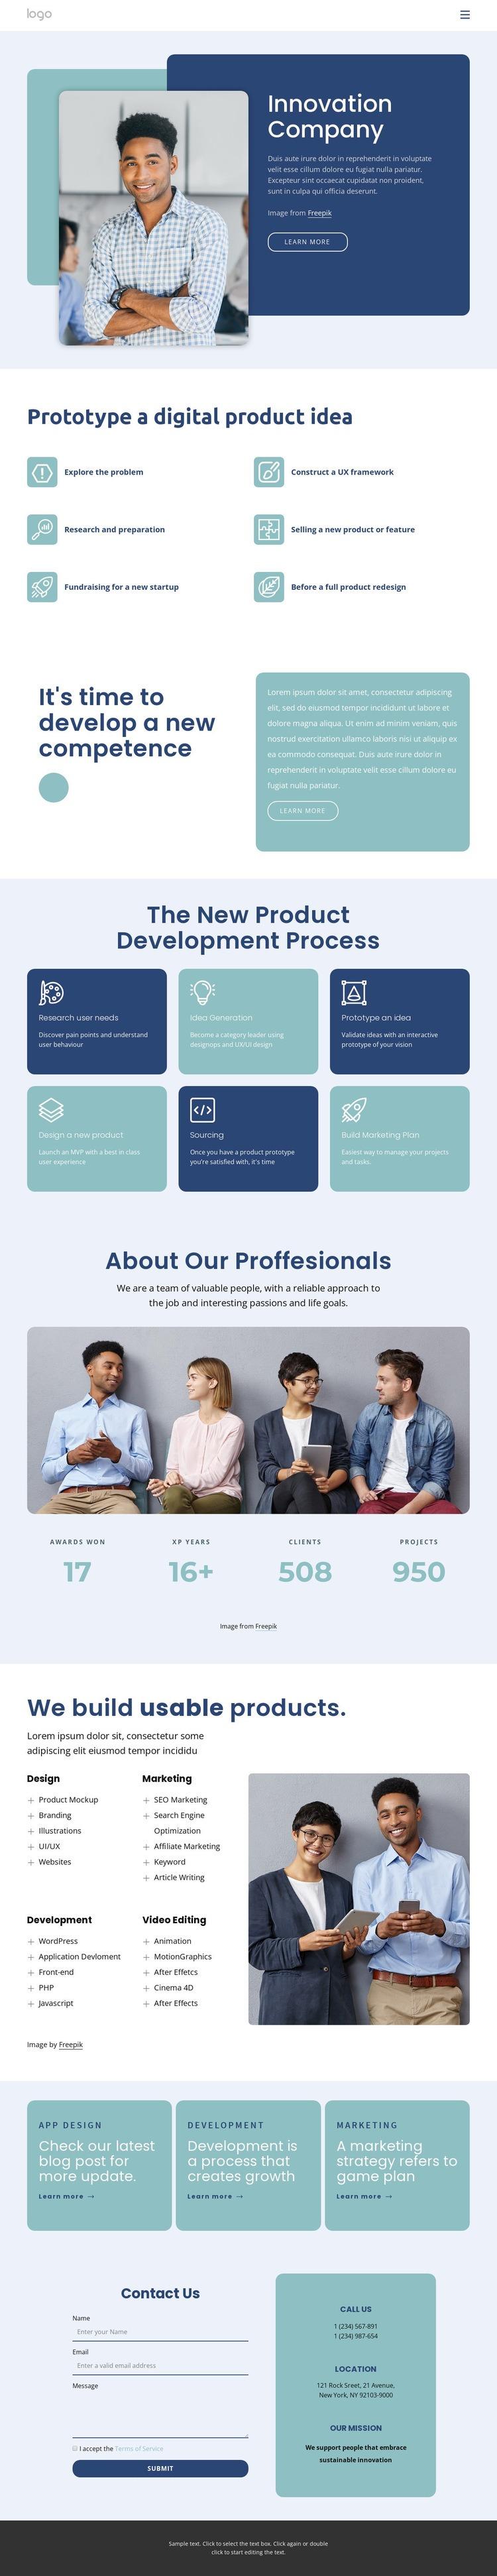 Innovation company Web Page Designer